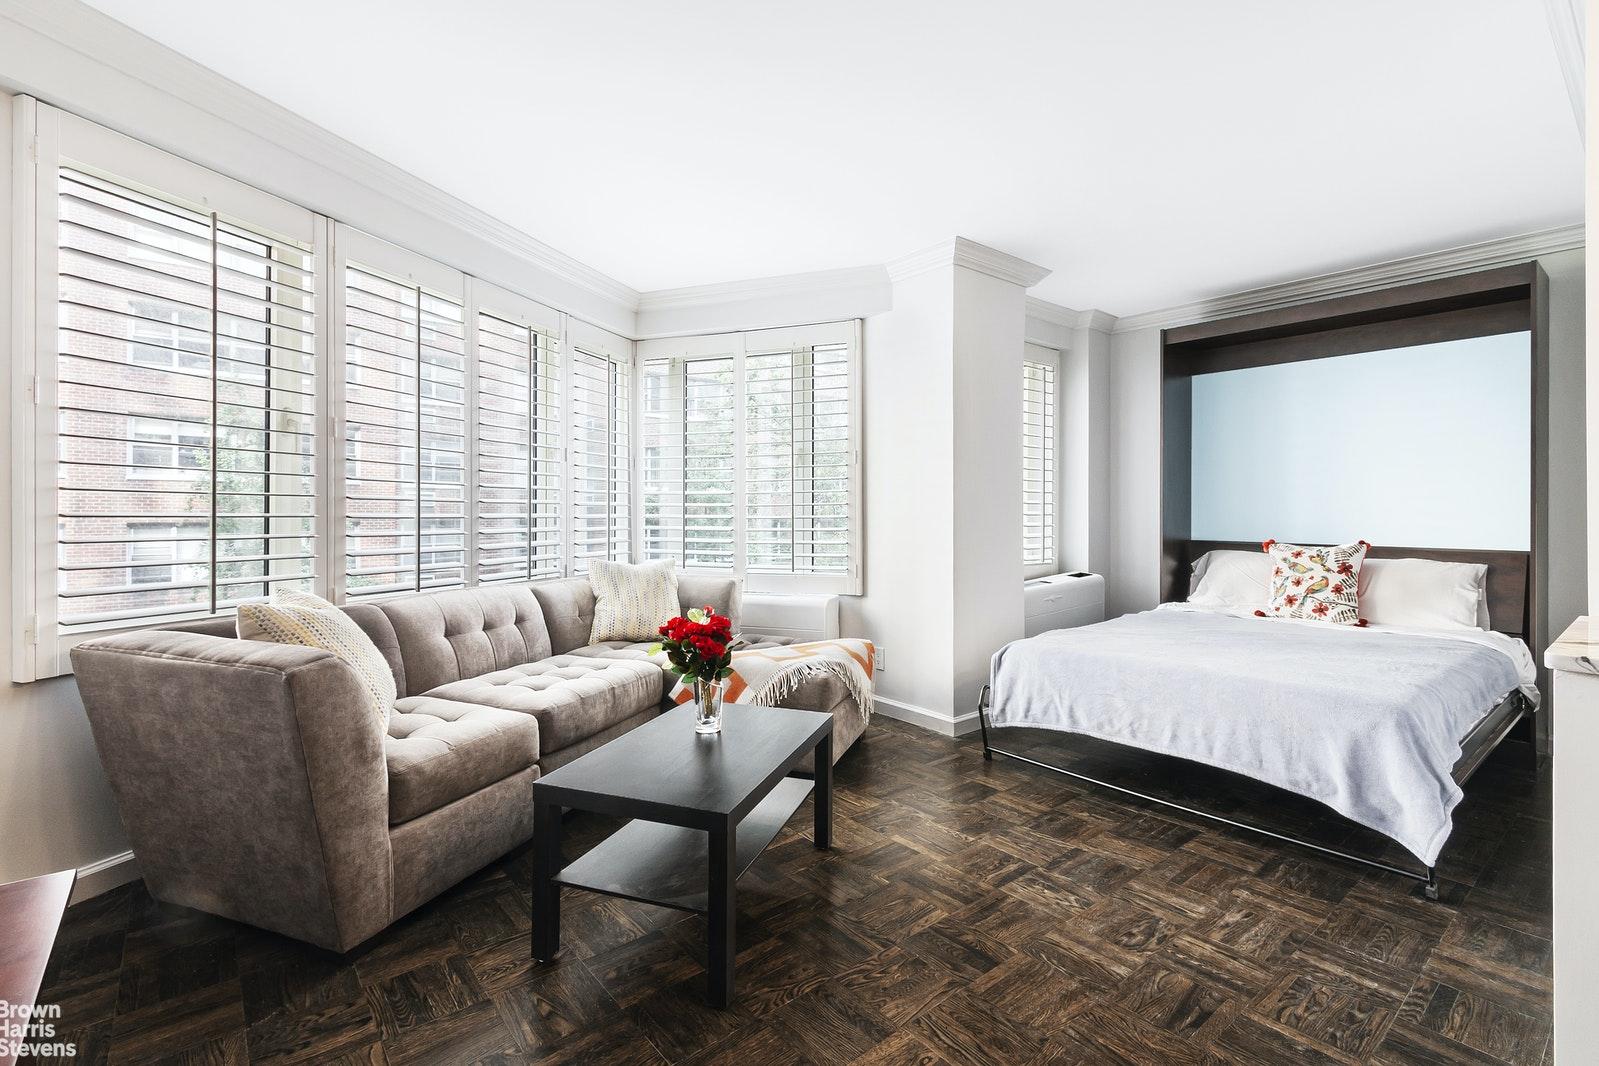 Apartment for sale at 60 Sutton Place South, Apt 4LN